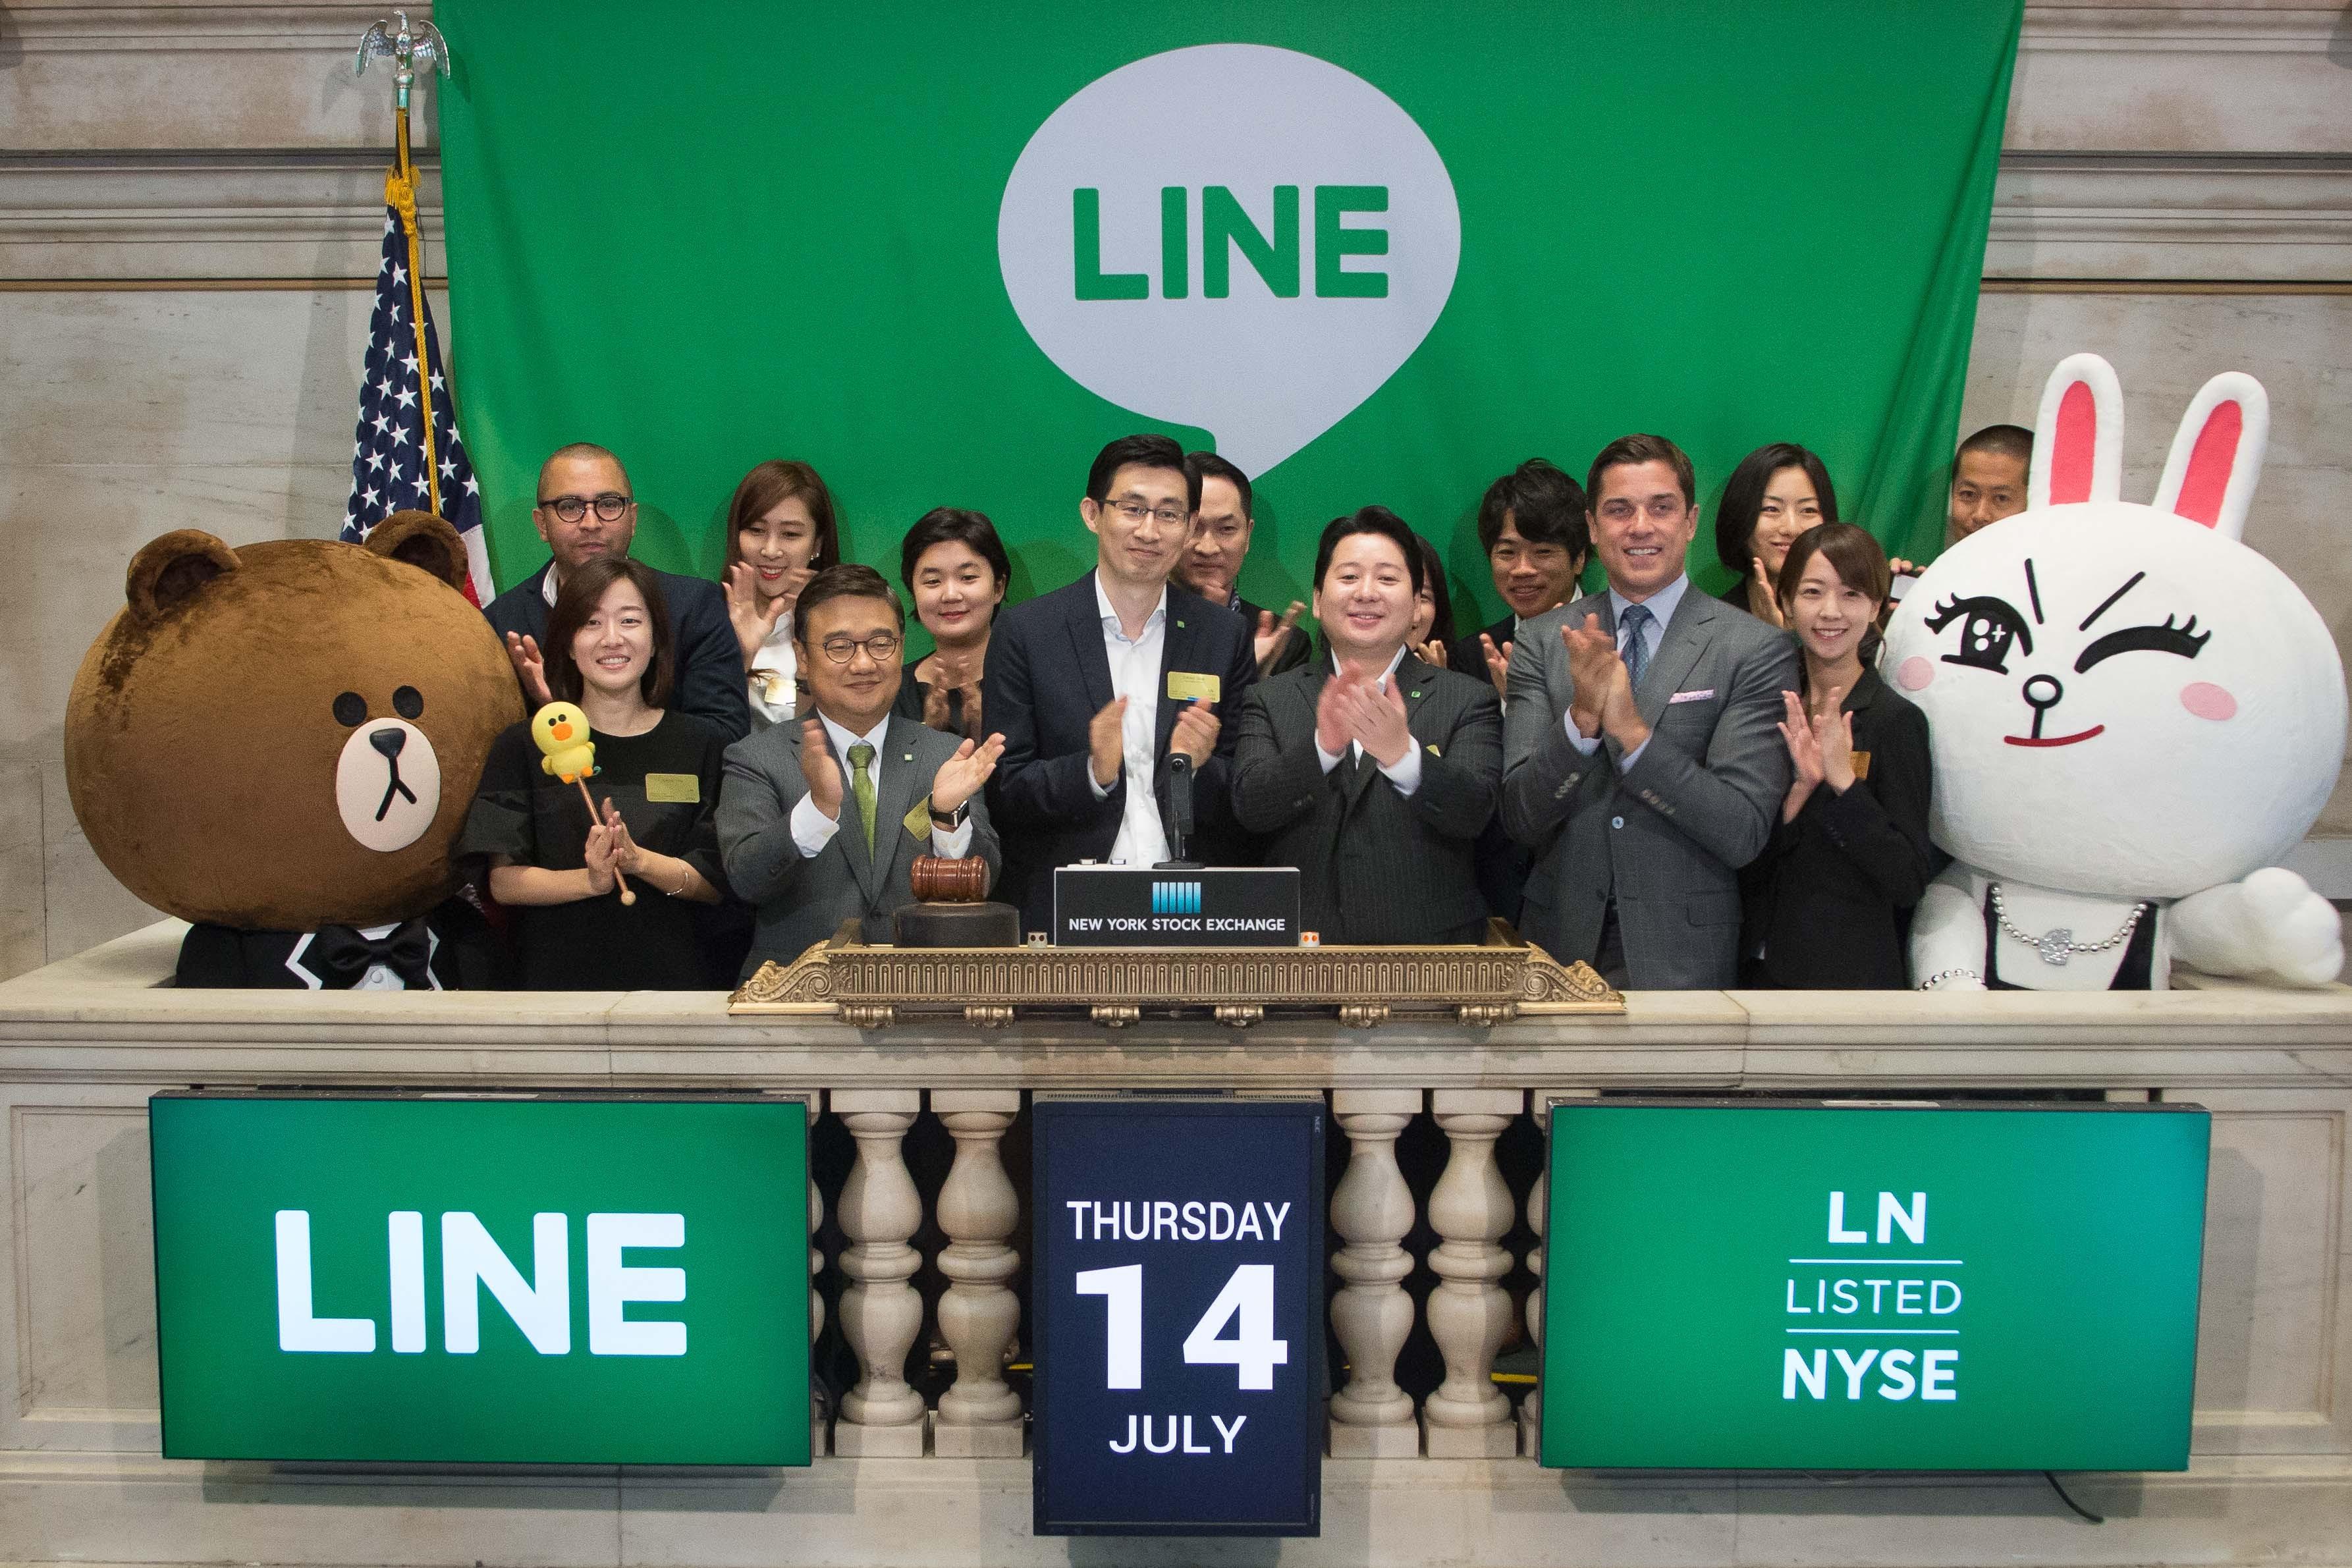 Corporation line